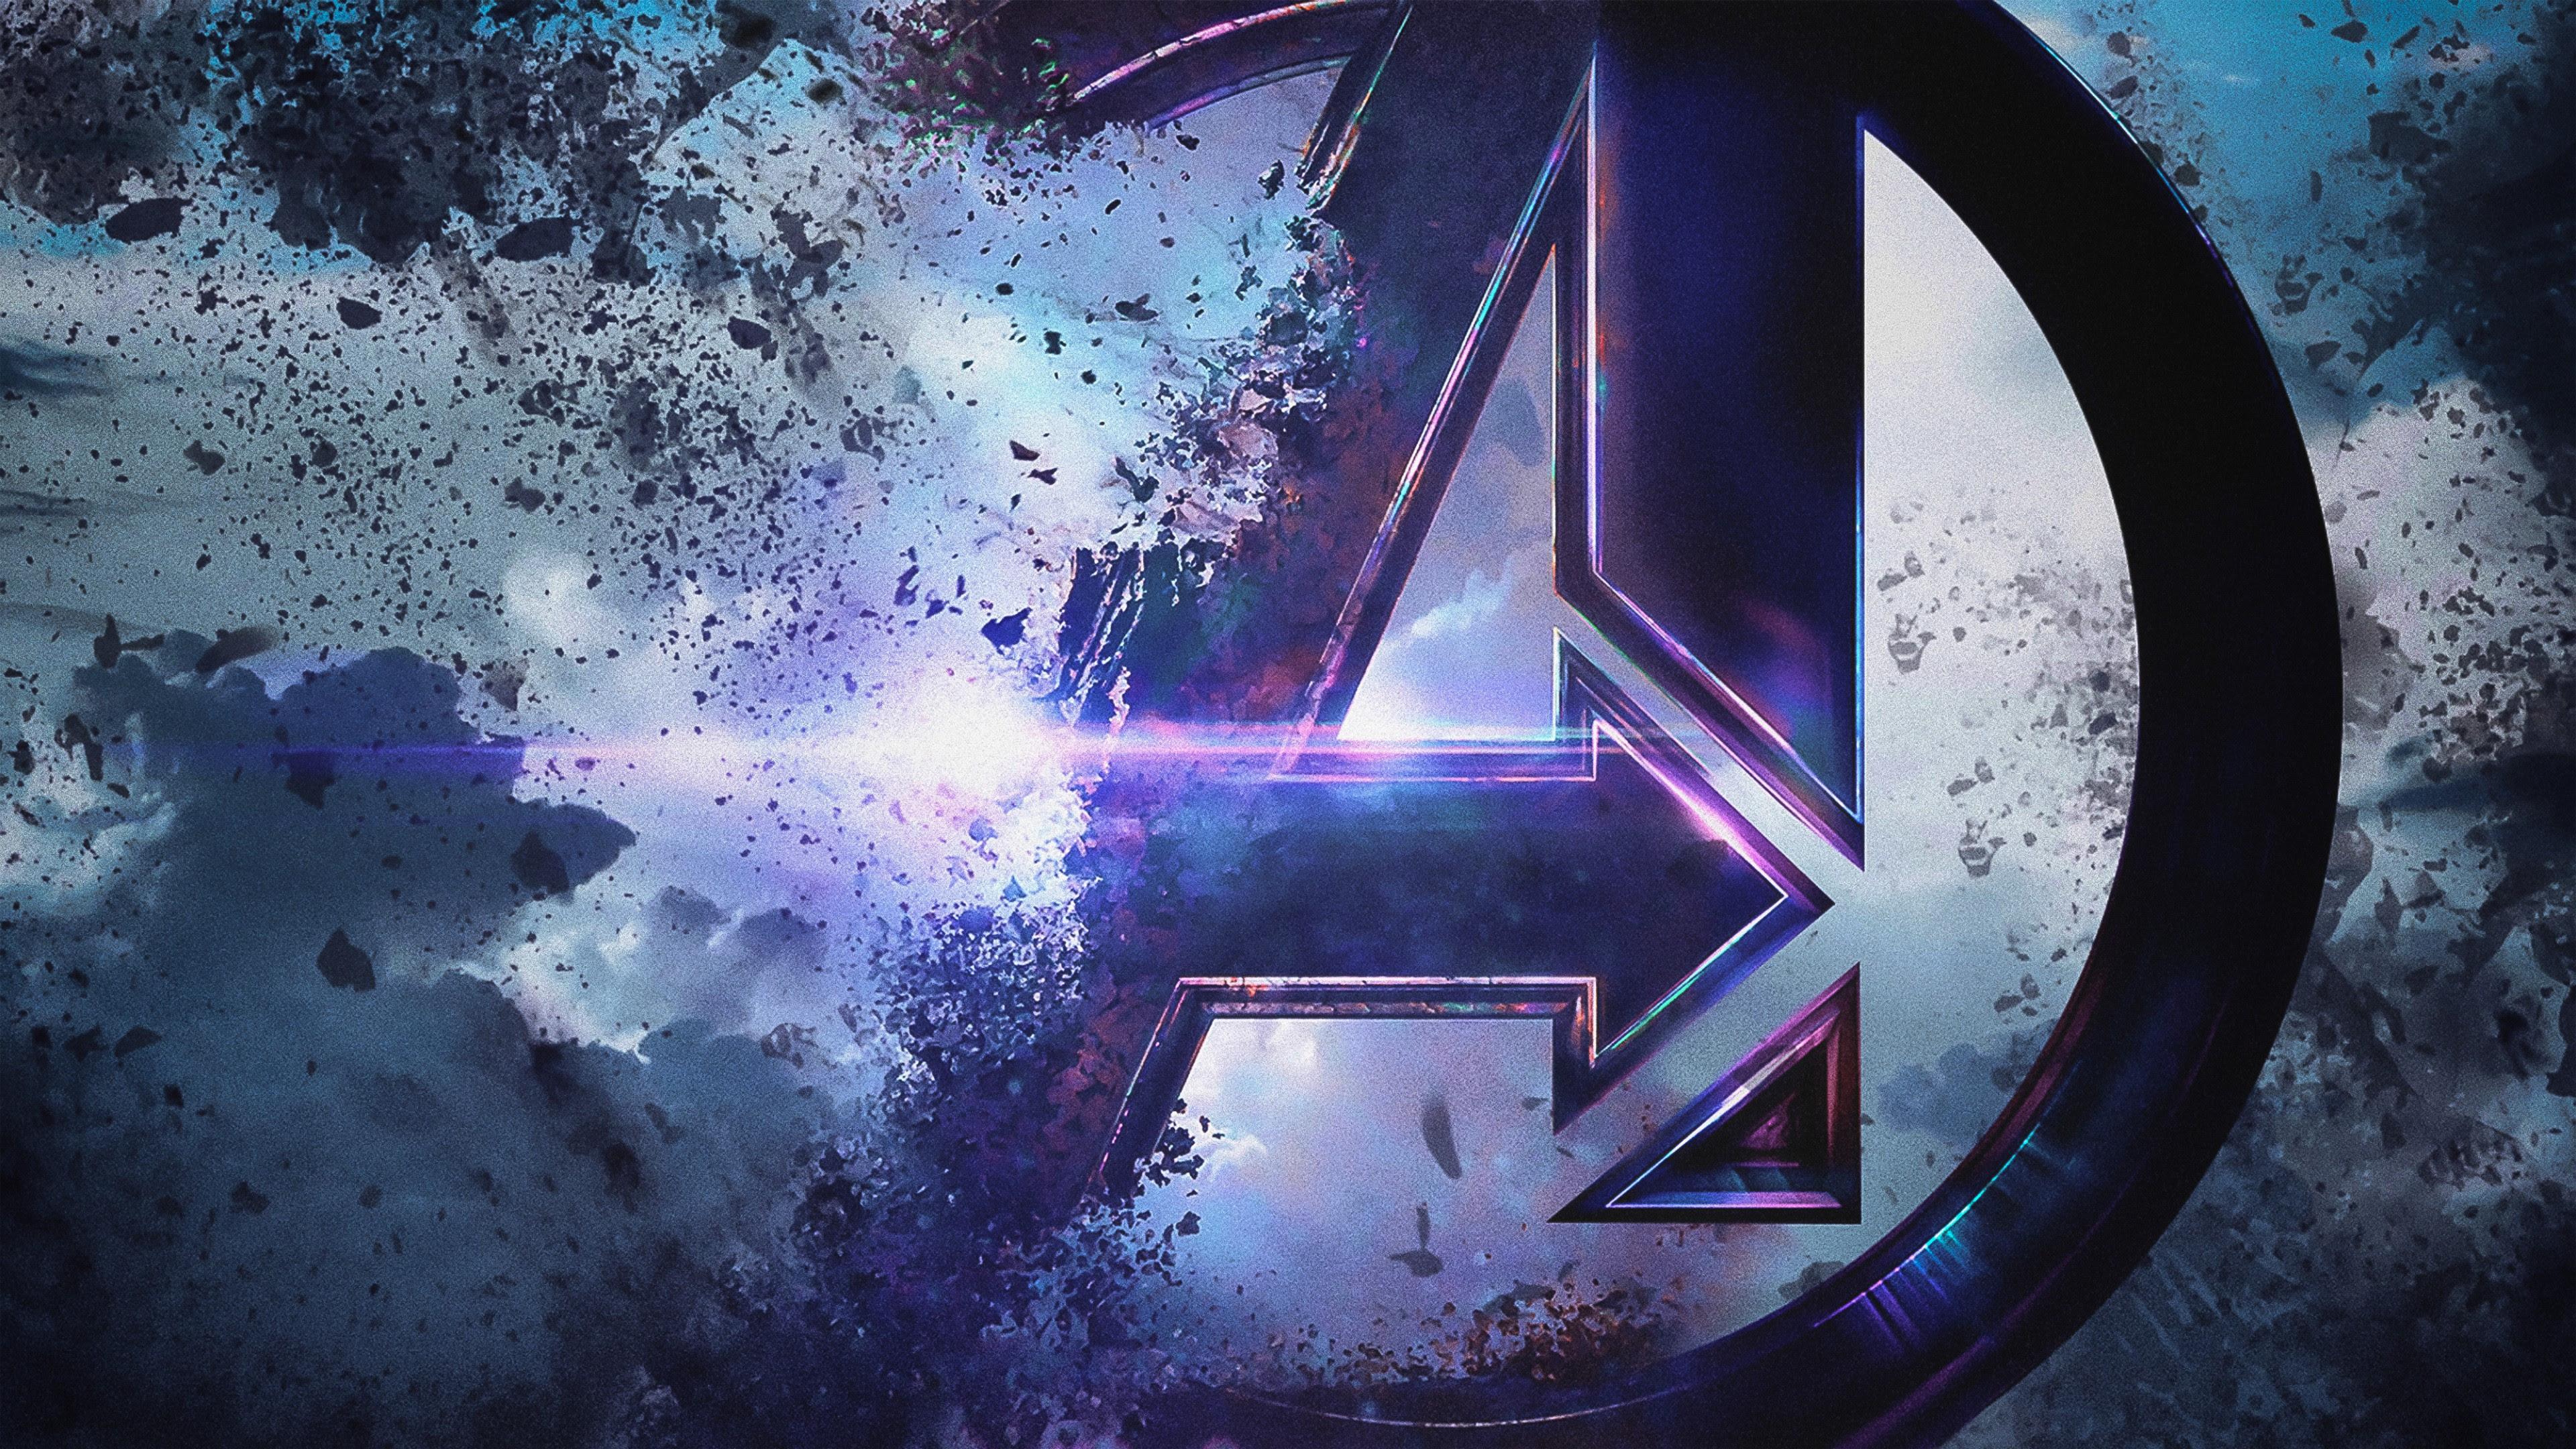 Avengers Endgame 4k Wallpapers Hd Wallpapers